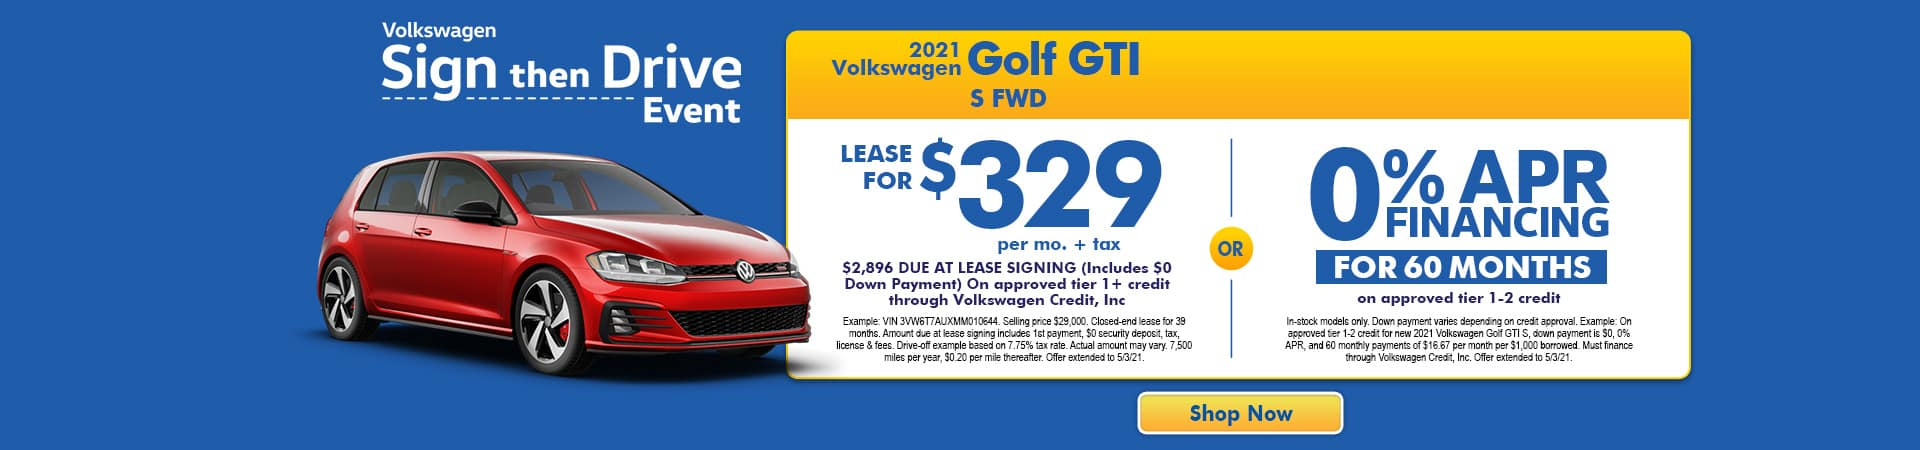 NRVW_Slides_1940x450_Branding_04-21_GolfGTI